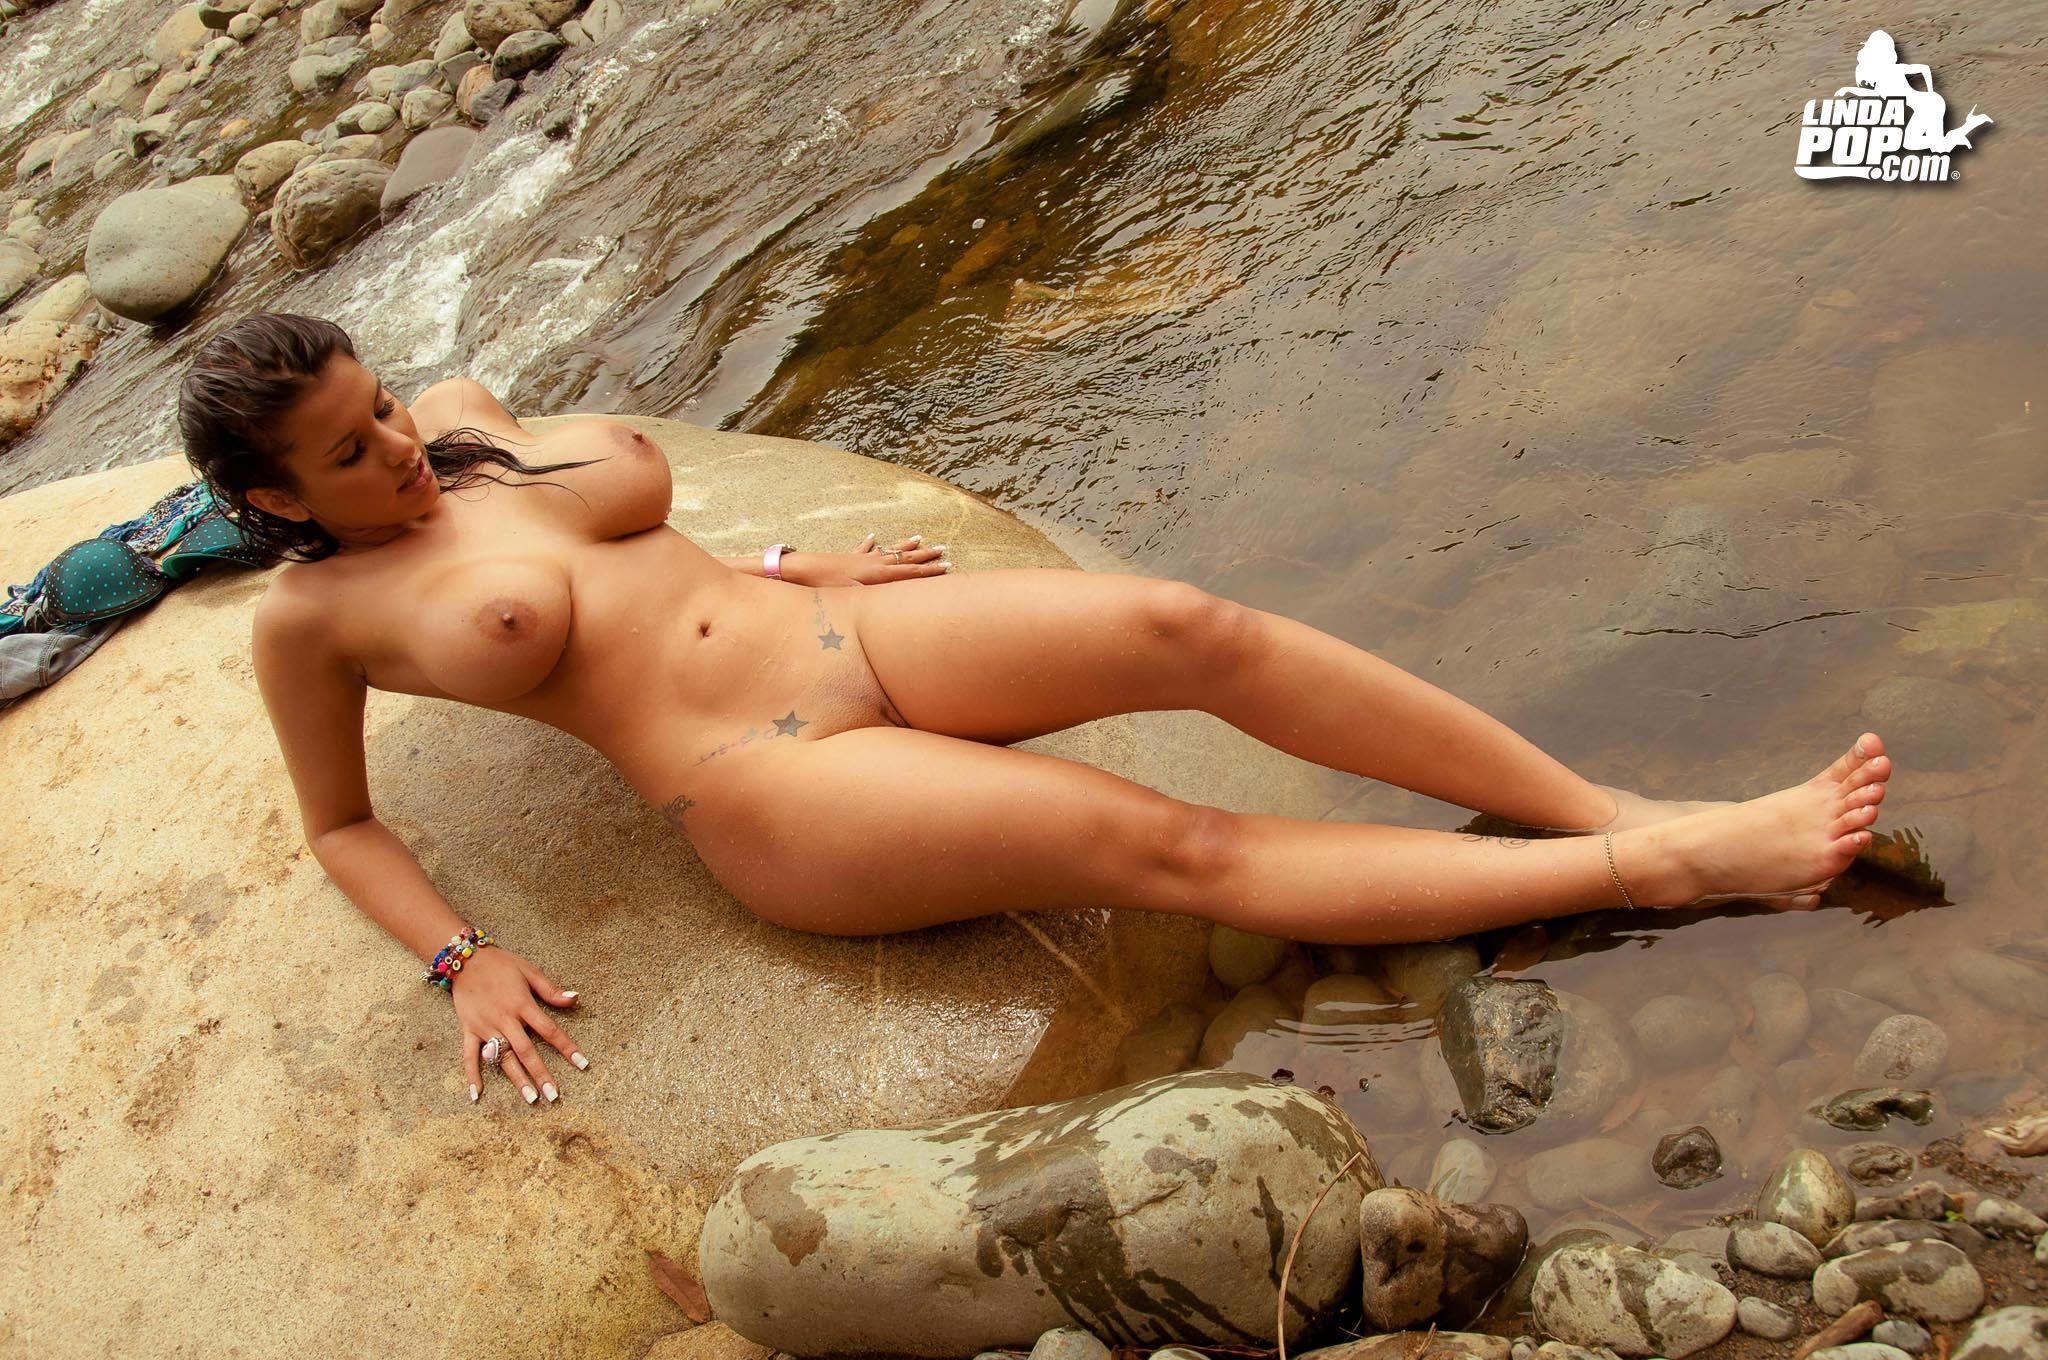 Mark wahlberg underwear nude